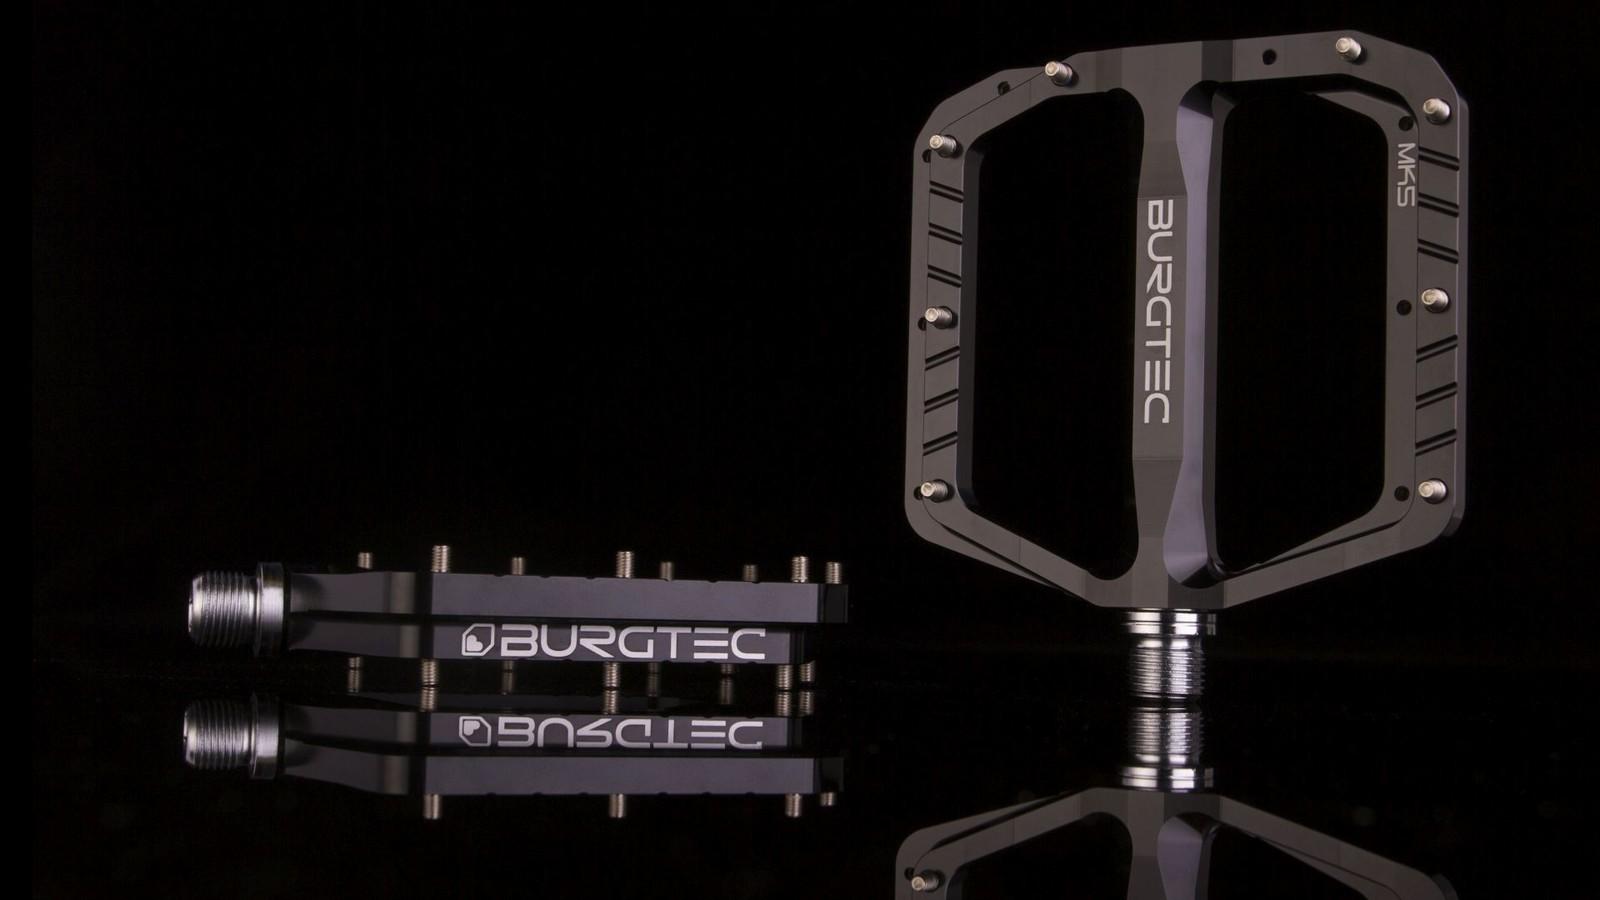 Burgtec Launches Penthouse Flat MK5 Pedals